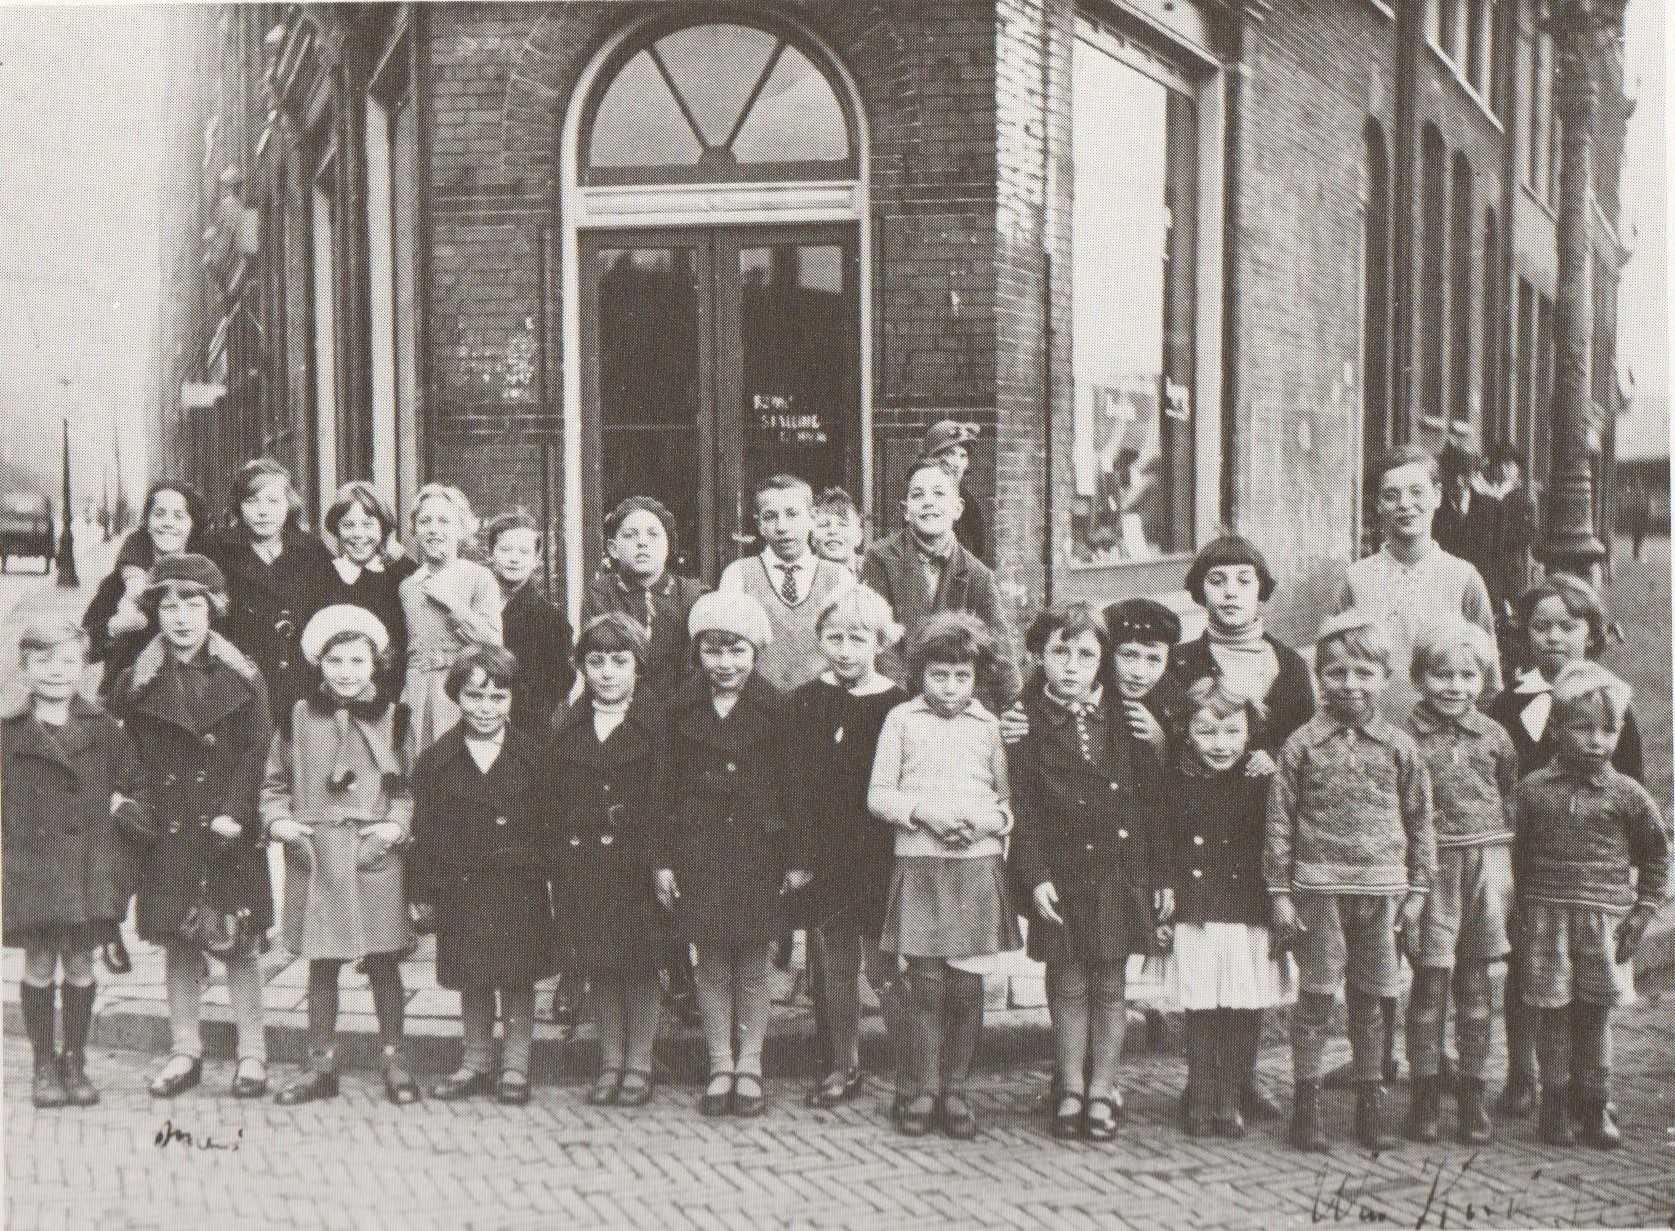 Kleding In Nederland.Over Kleding En Matzes 2 Geheugen Van Oost